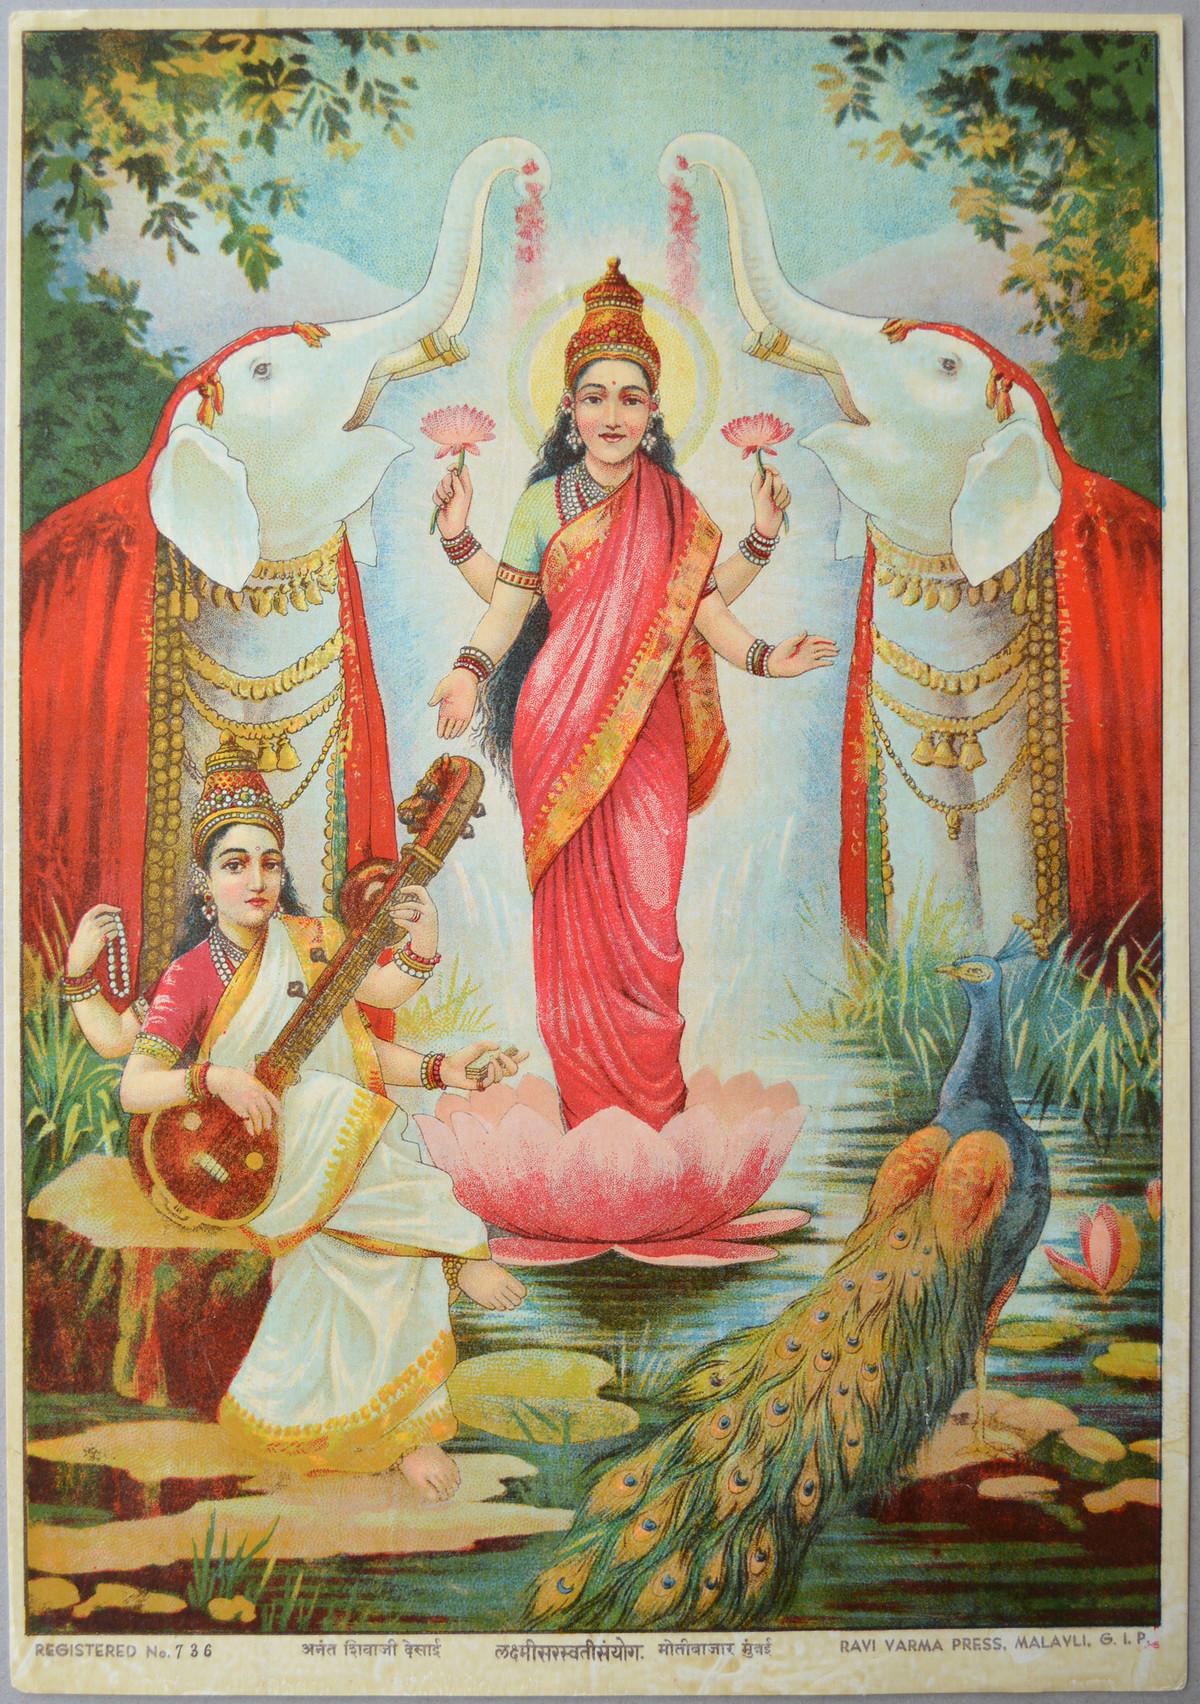 Laxmi Saraswati Sanyog by Raja Ravi Varma, Expressionism Printmaking, Lithography on Paper, Eagle color